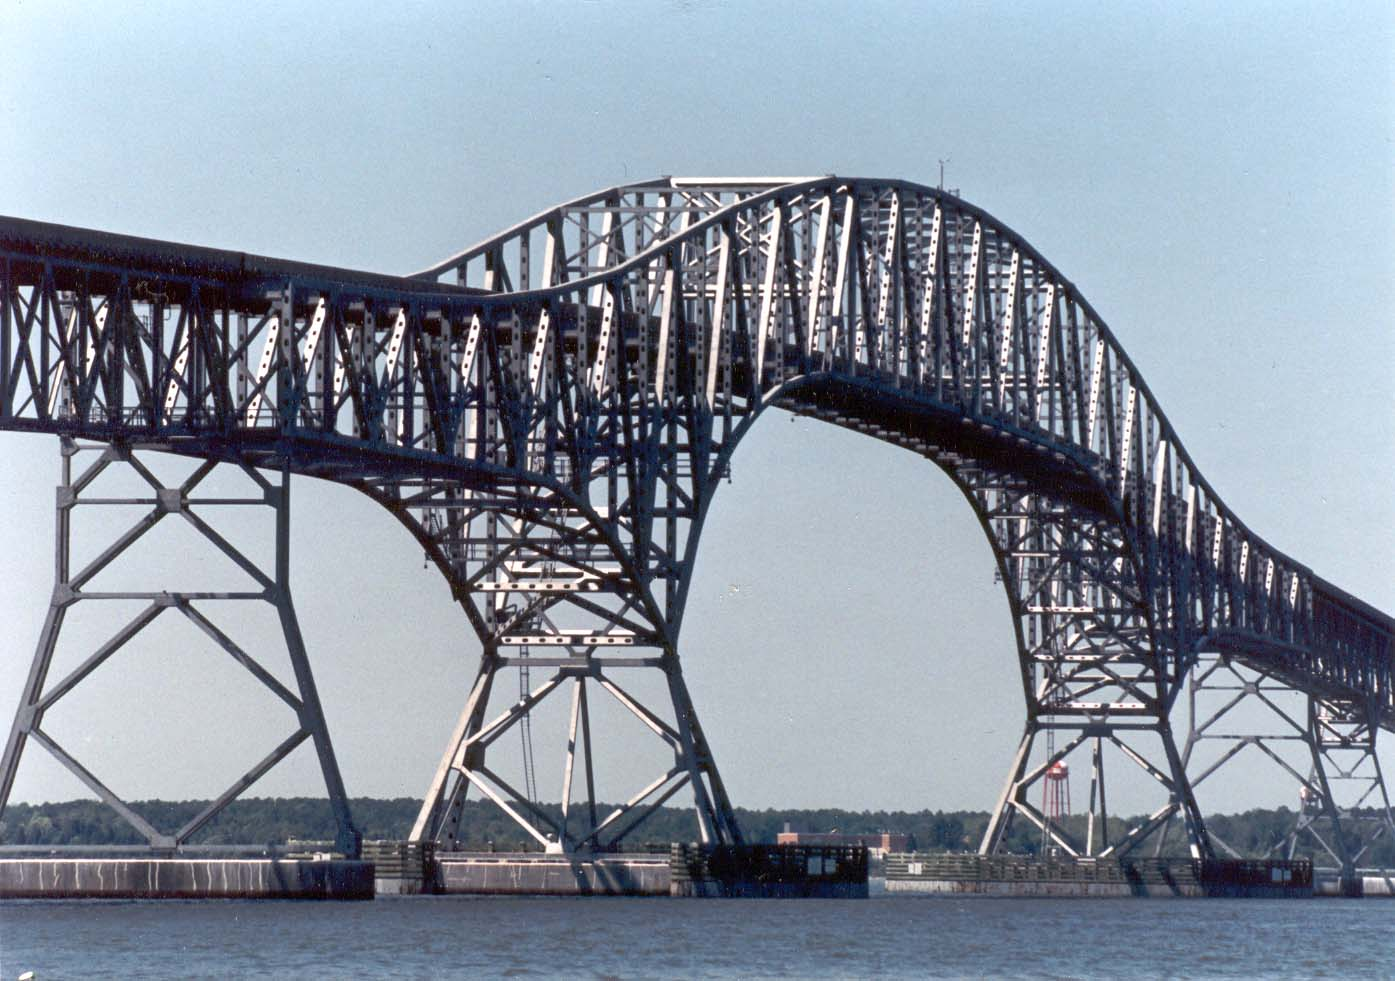 Governor Harry W. Nice Memorial Bridge (US301)